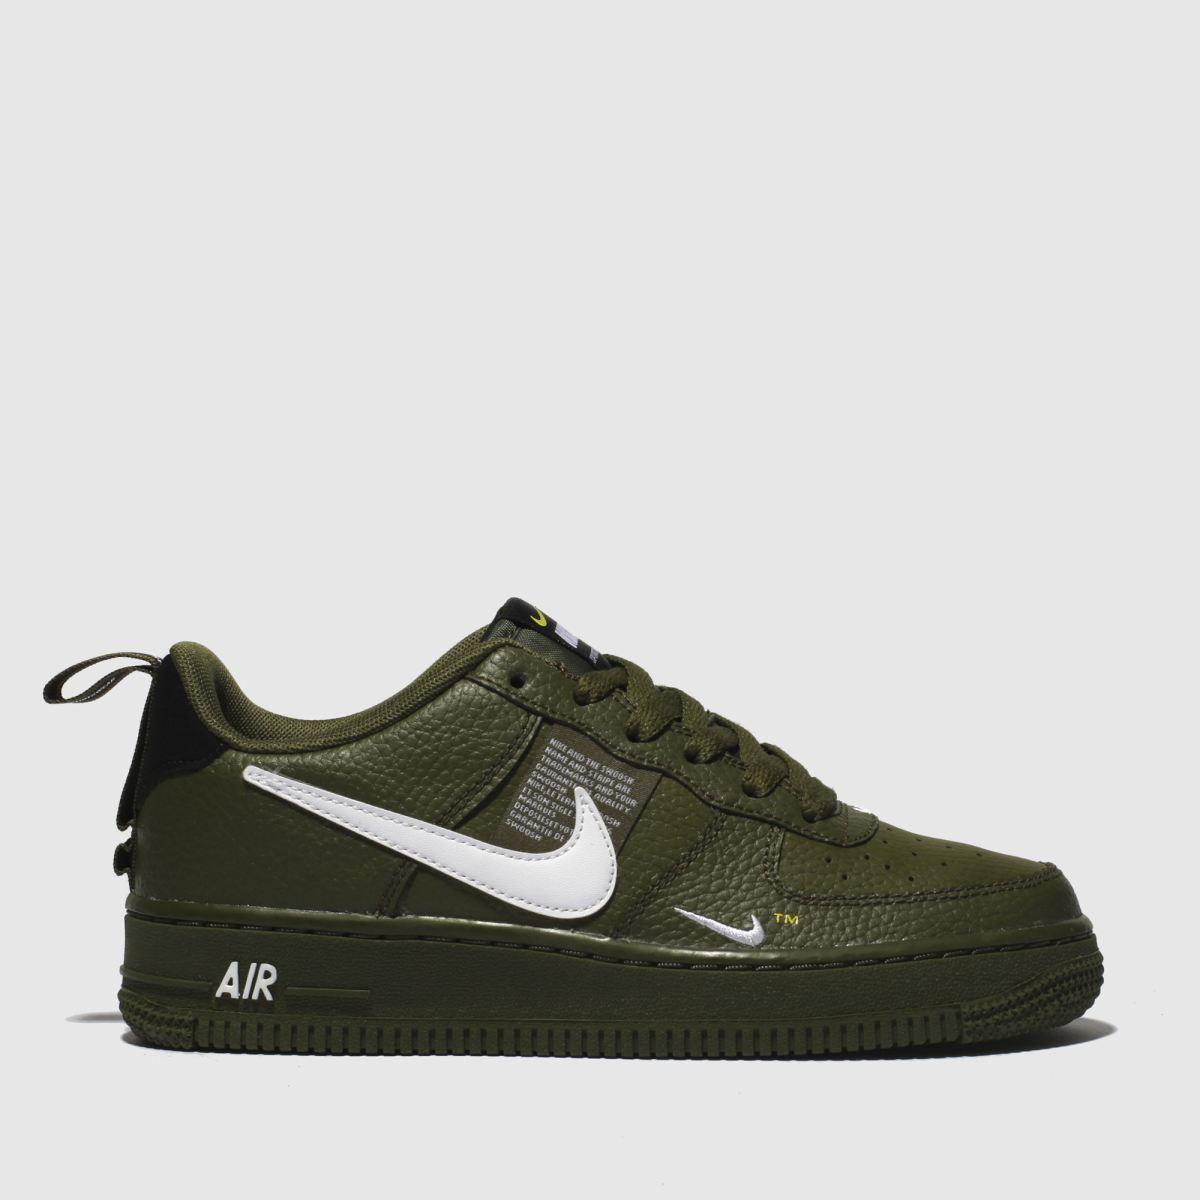 Nike Khaki Air Force 1 Lv8 Utility Trainers Youth